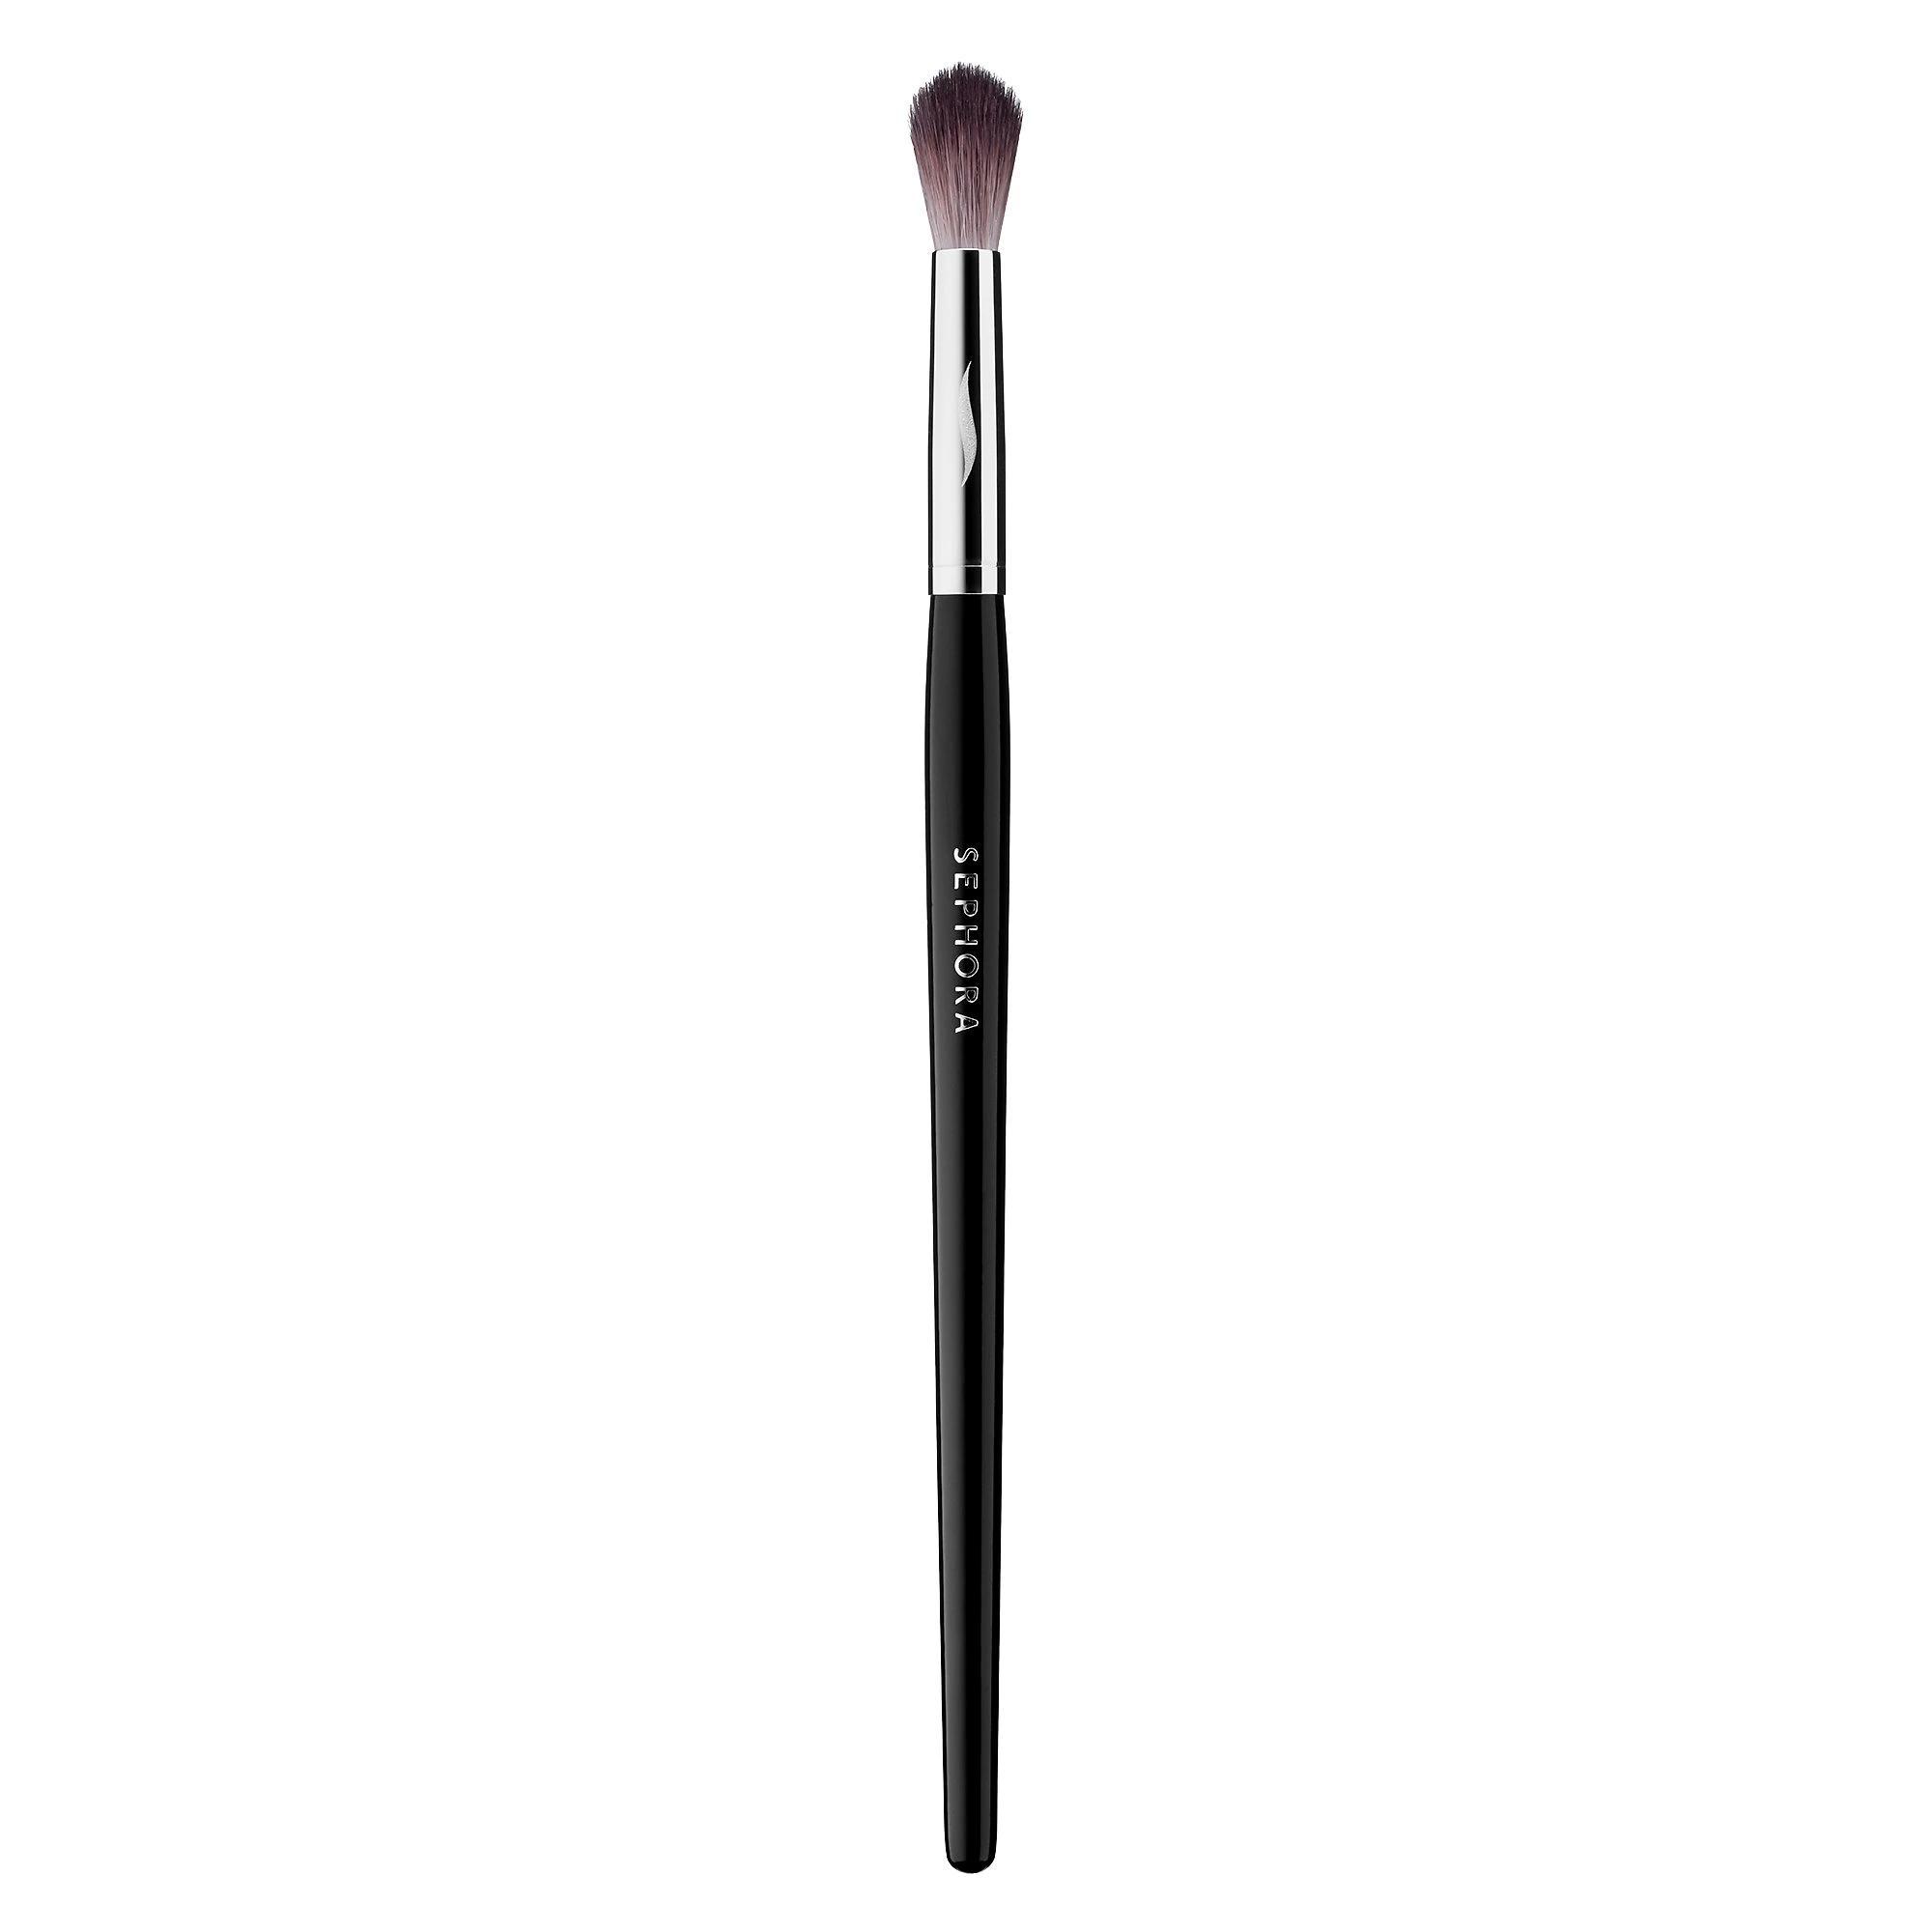 Sephora PRO Featherweight Crease Brush #38